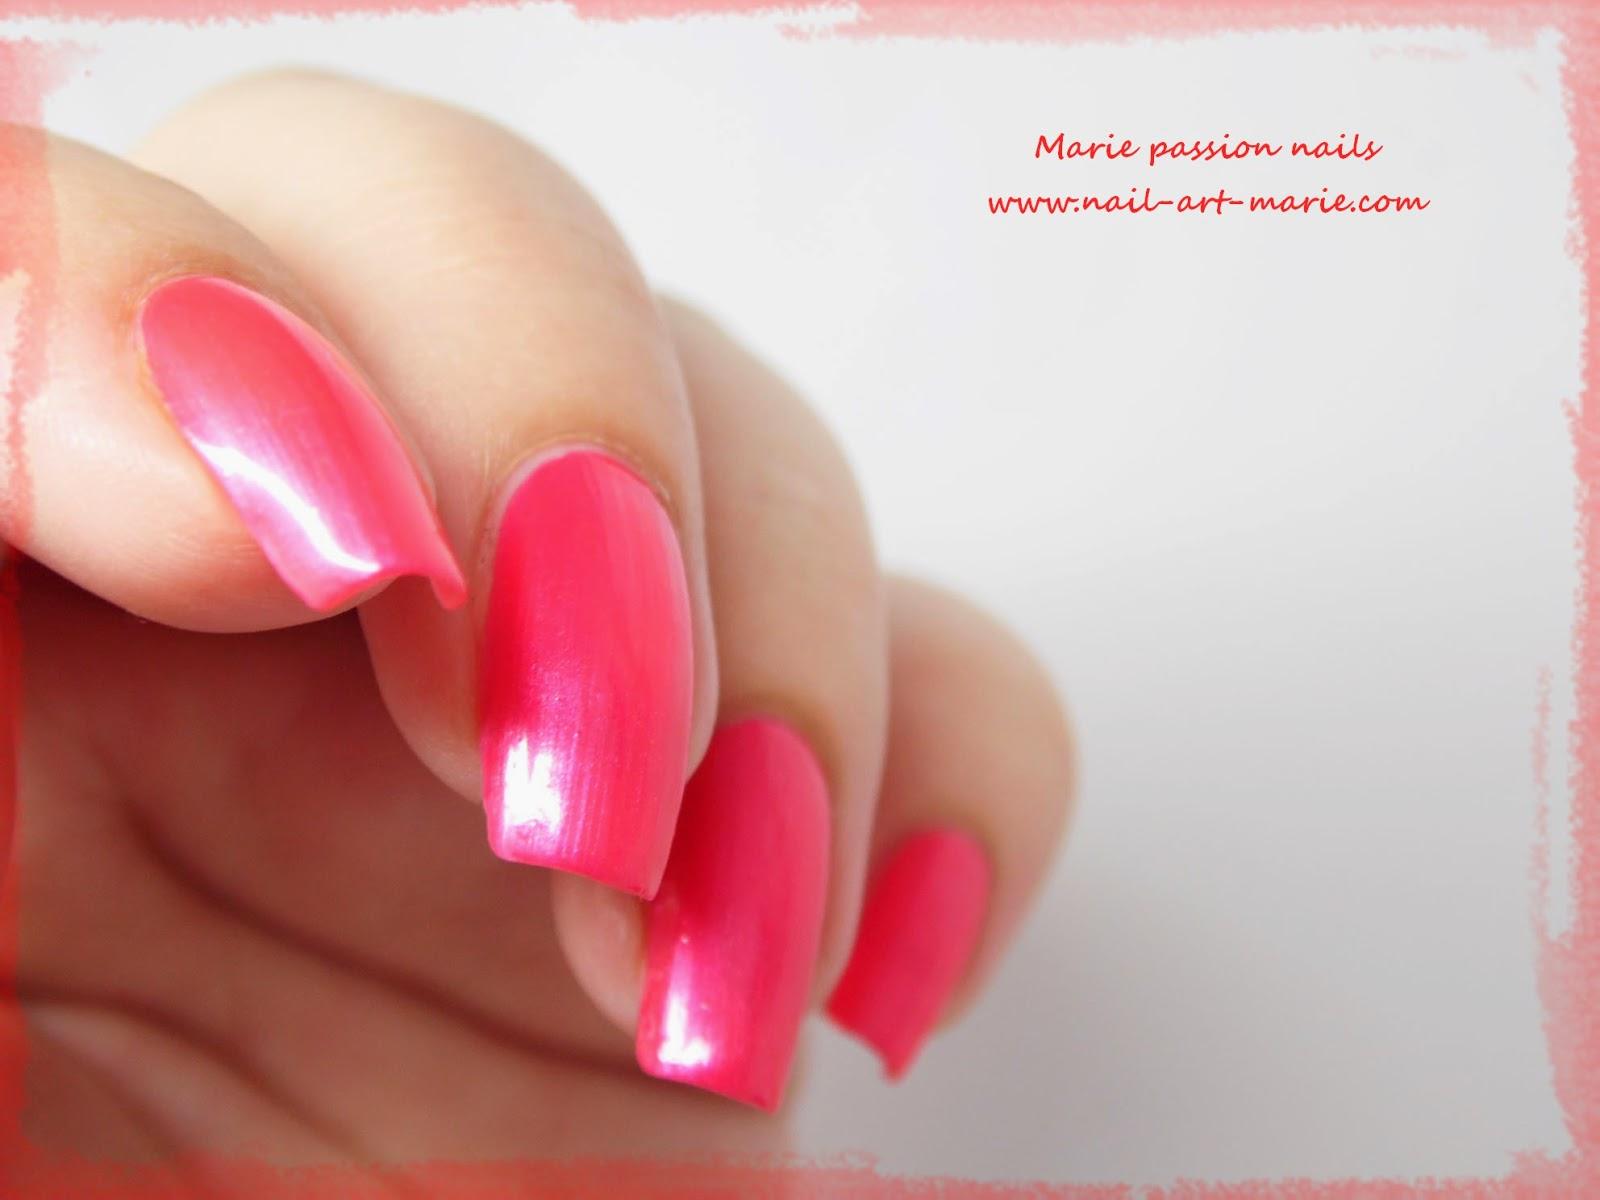 LM Cosmetic Fonte Nova6